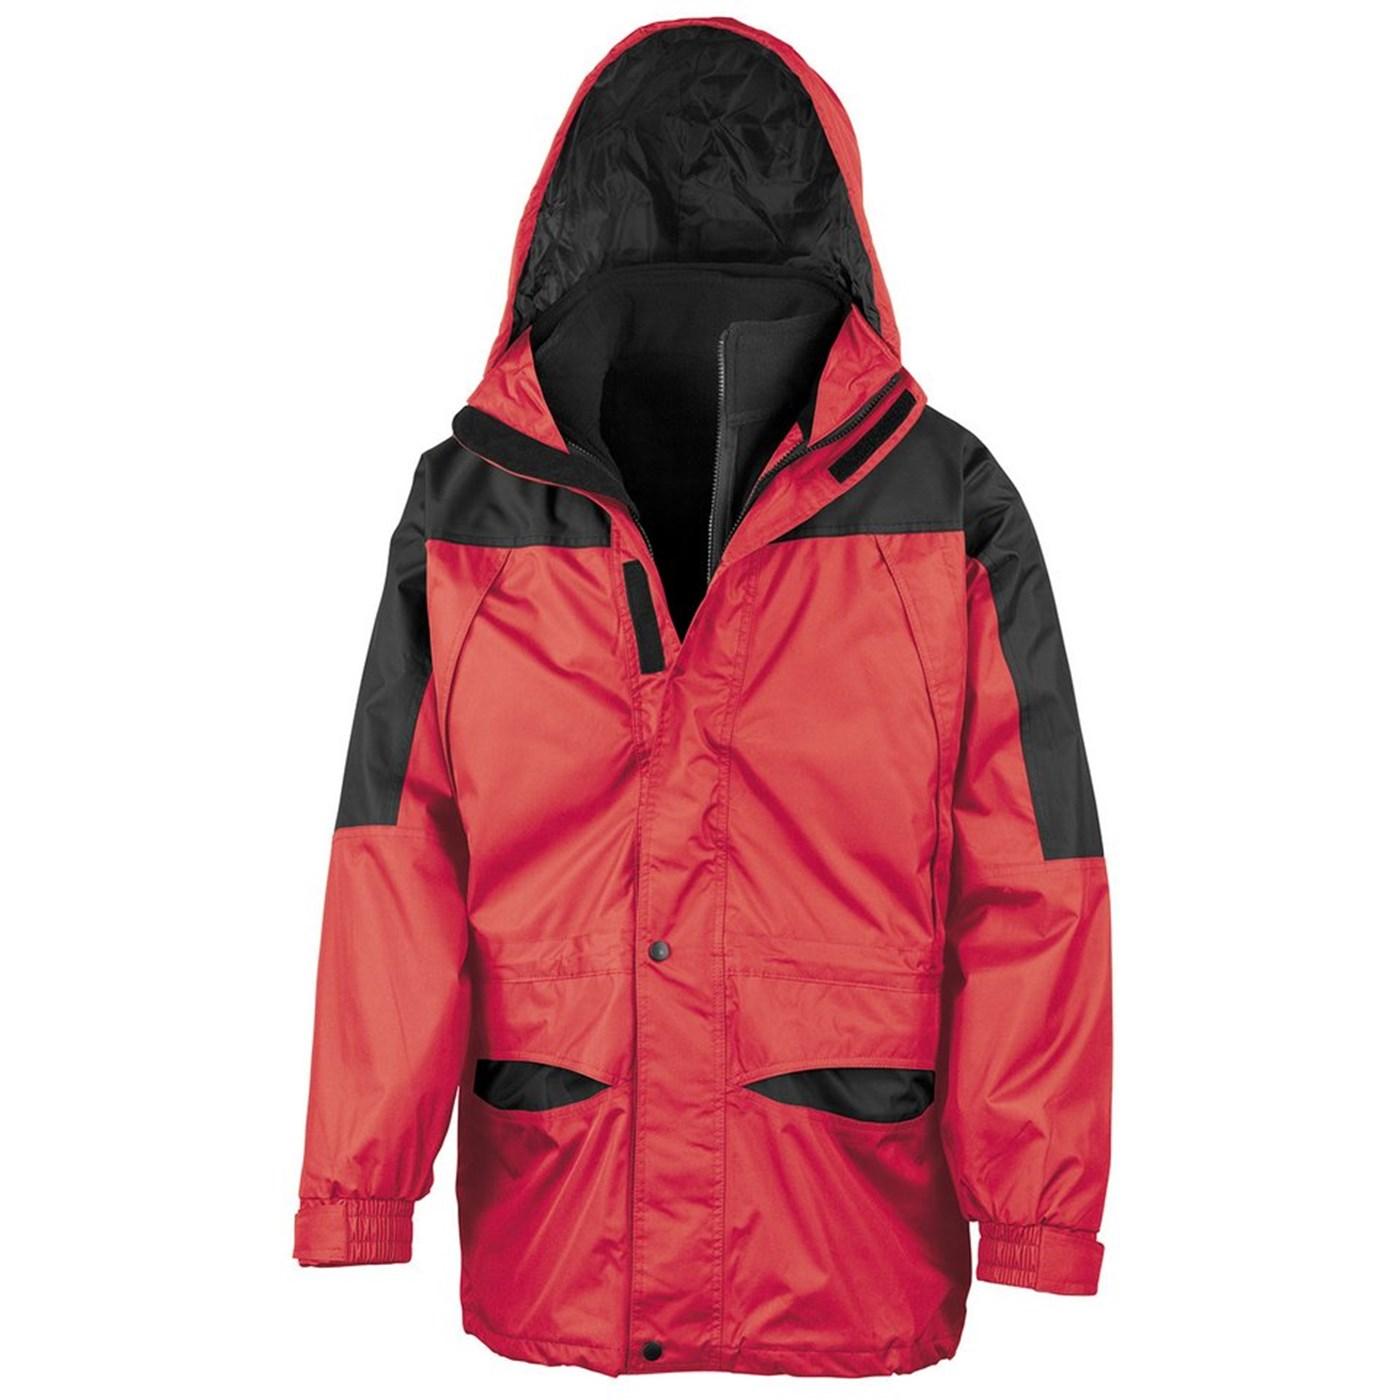 b86e4e2d1 Result Men's Alaska 3-in-1 Winter Jacket RE99A